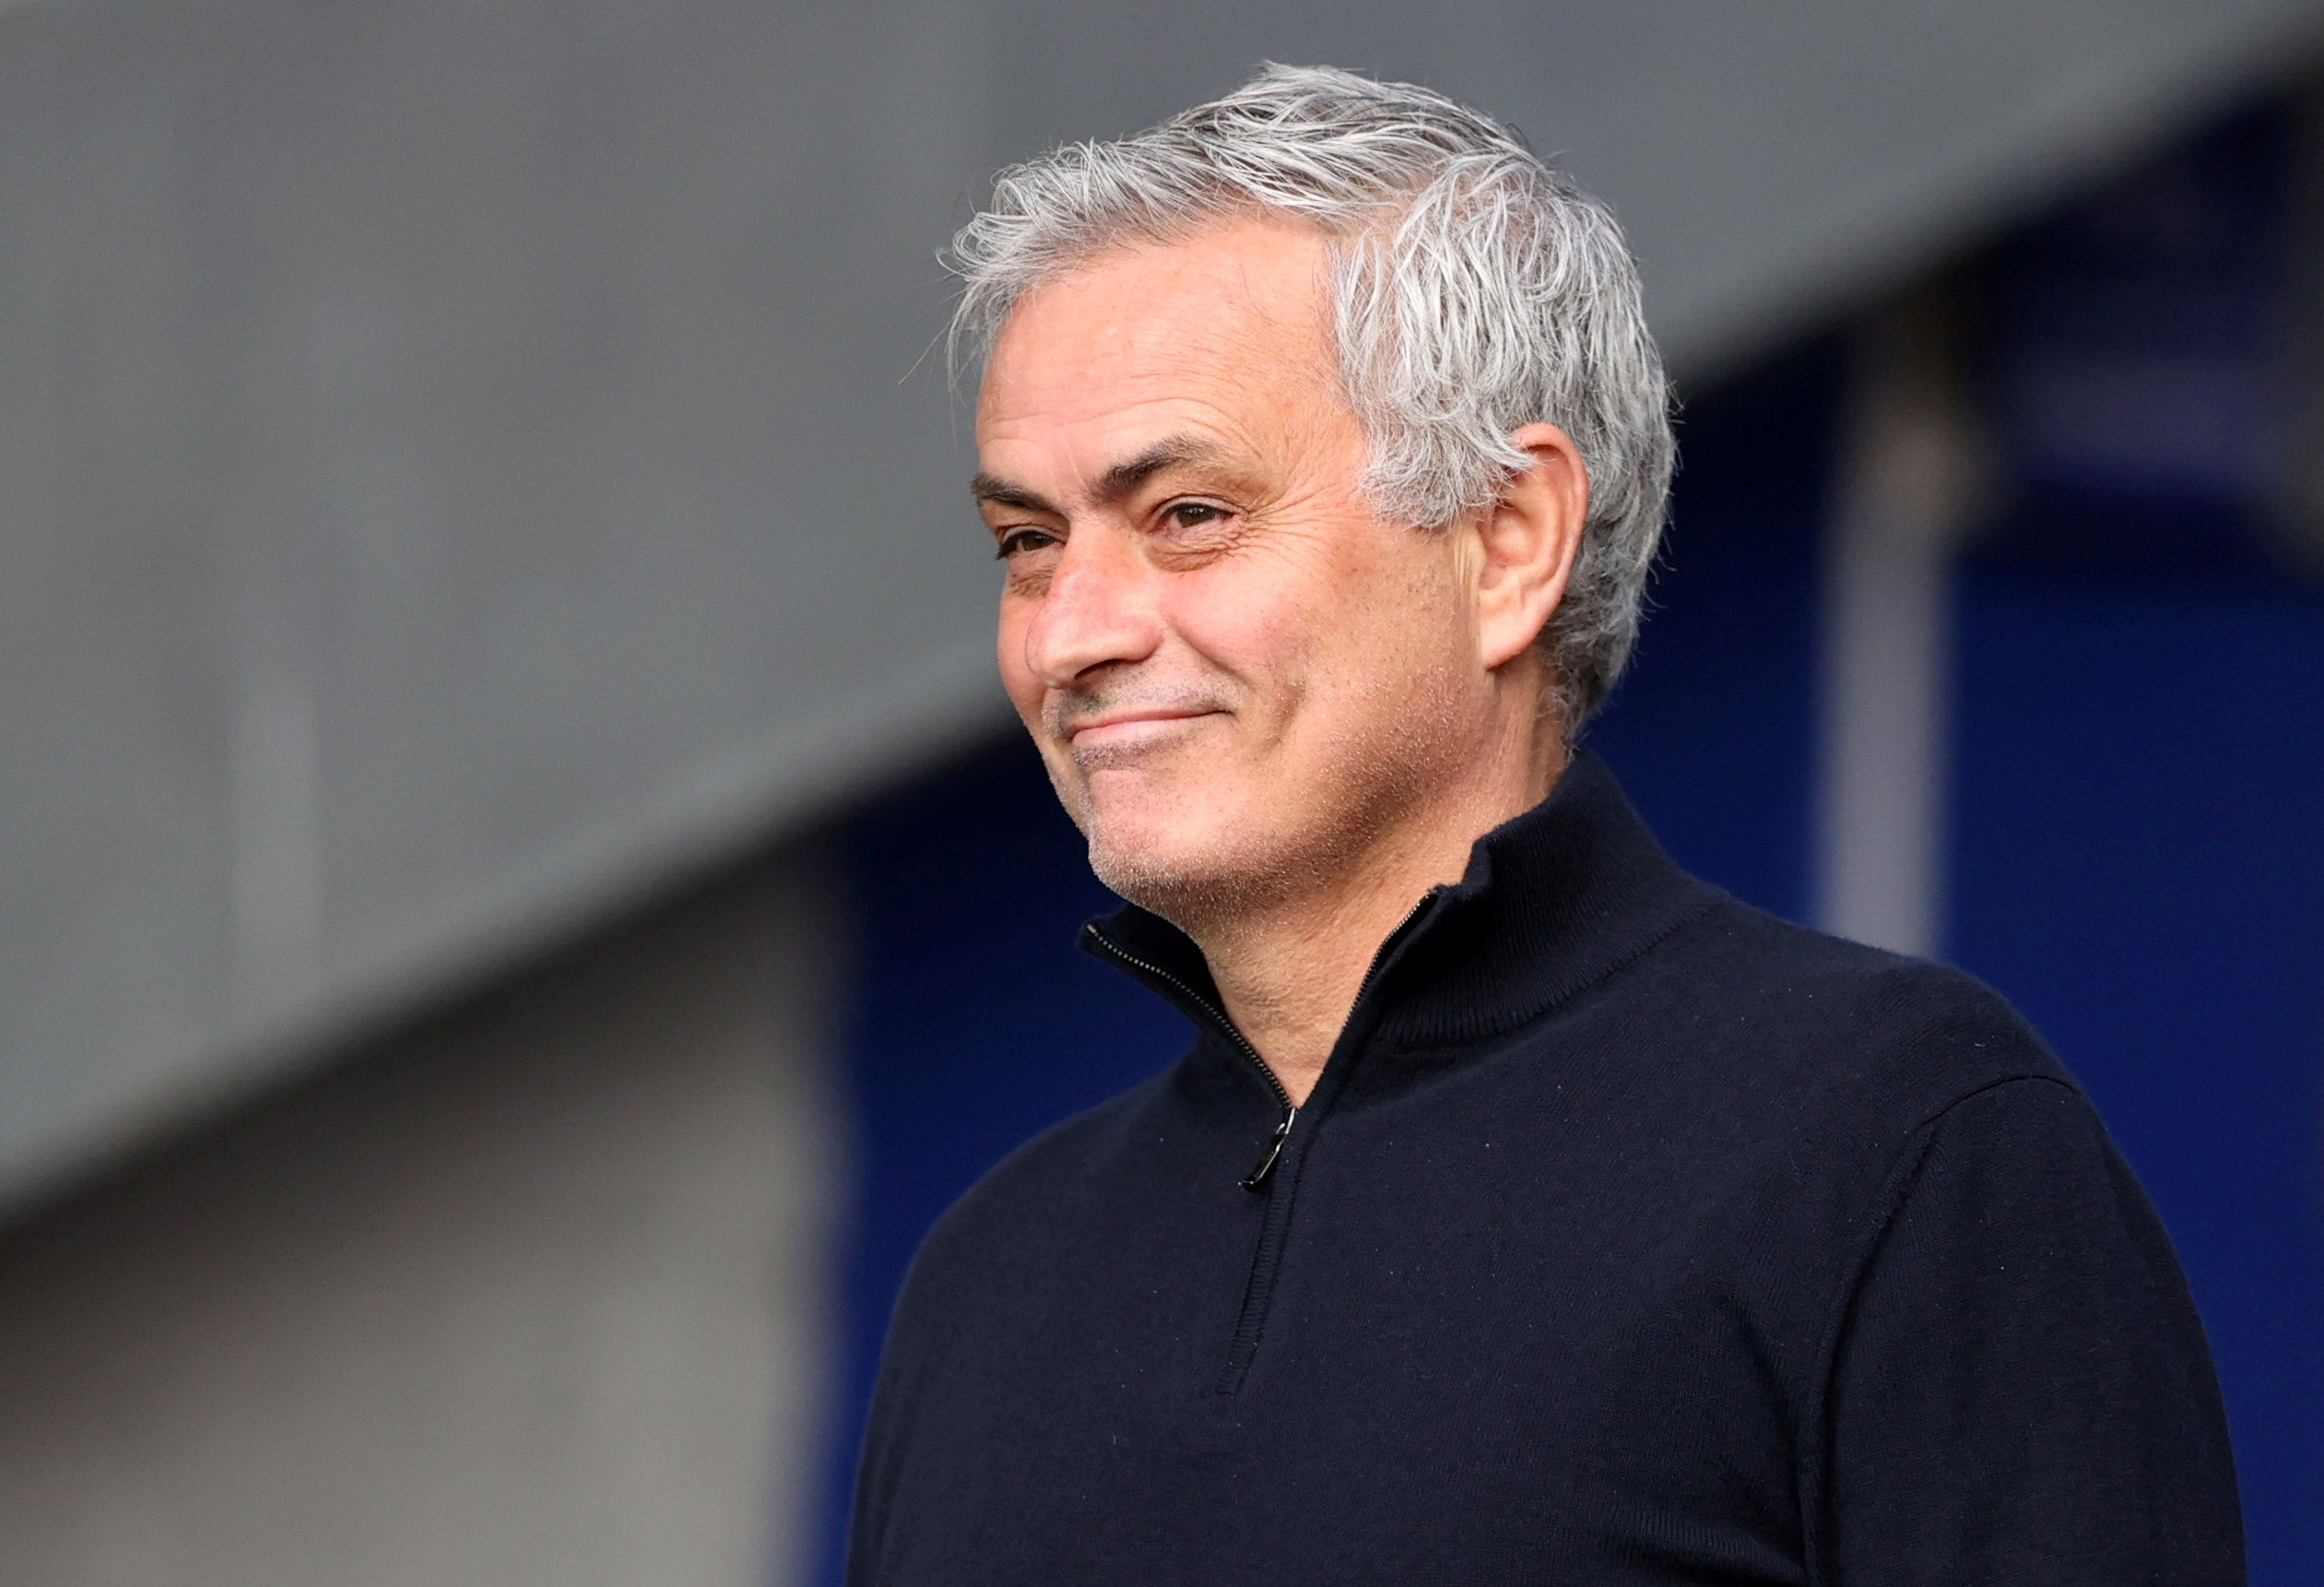 José Mourinho, nuevo entrenador de Roma (REUTERS/Clive Brunskill)